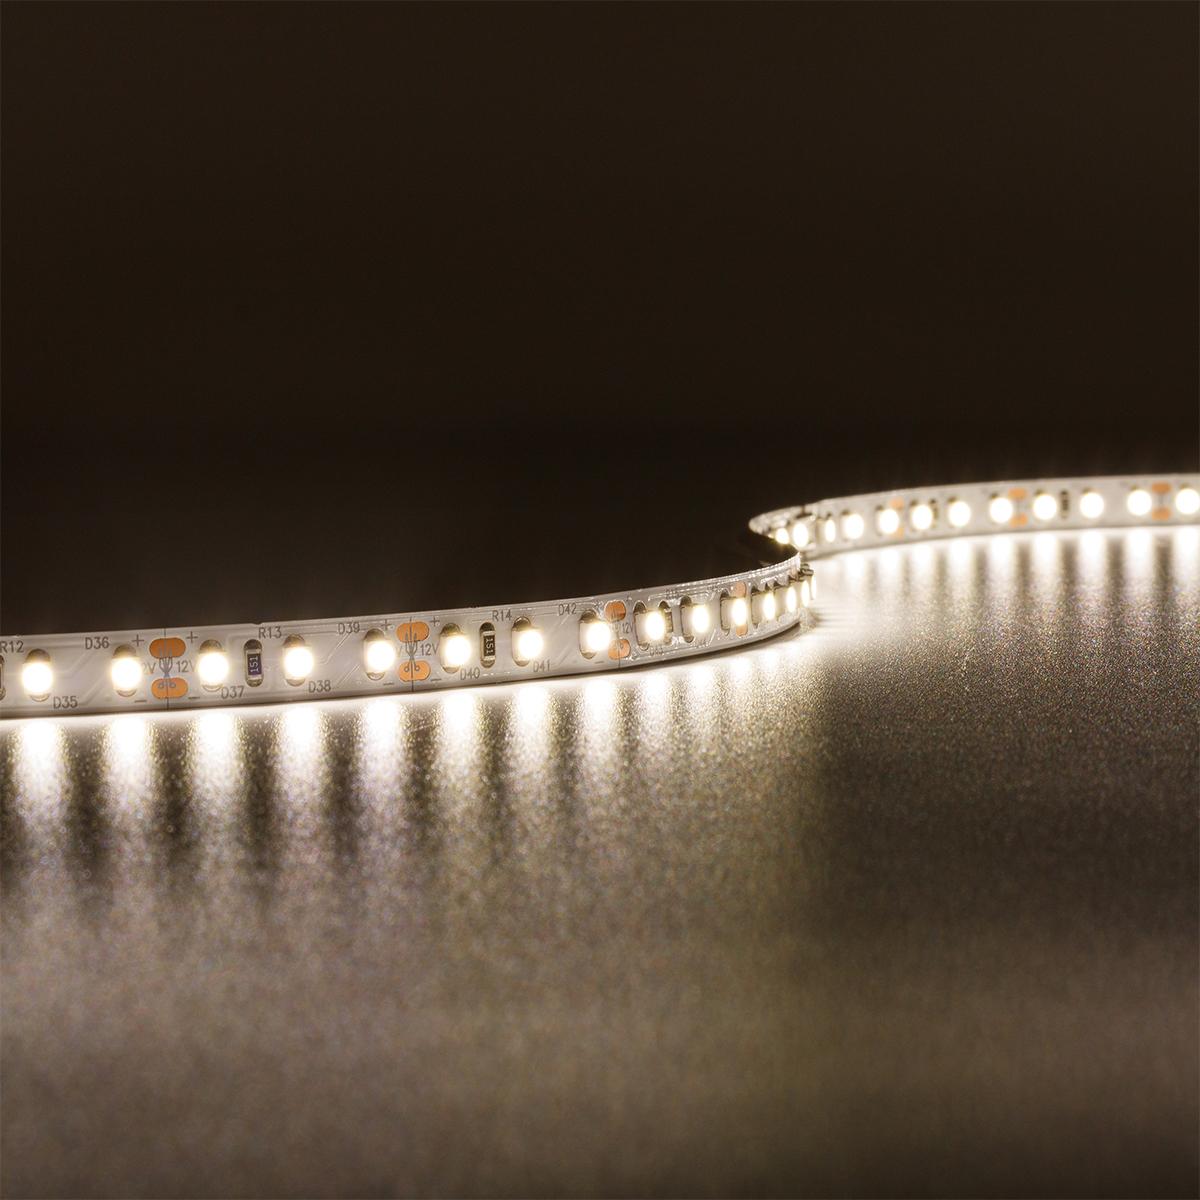 Strip Neutralweiß 12V LED Streifen 5M 9,6W/m 120LED/m 8mm IP20 4000K